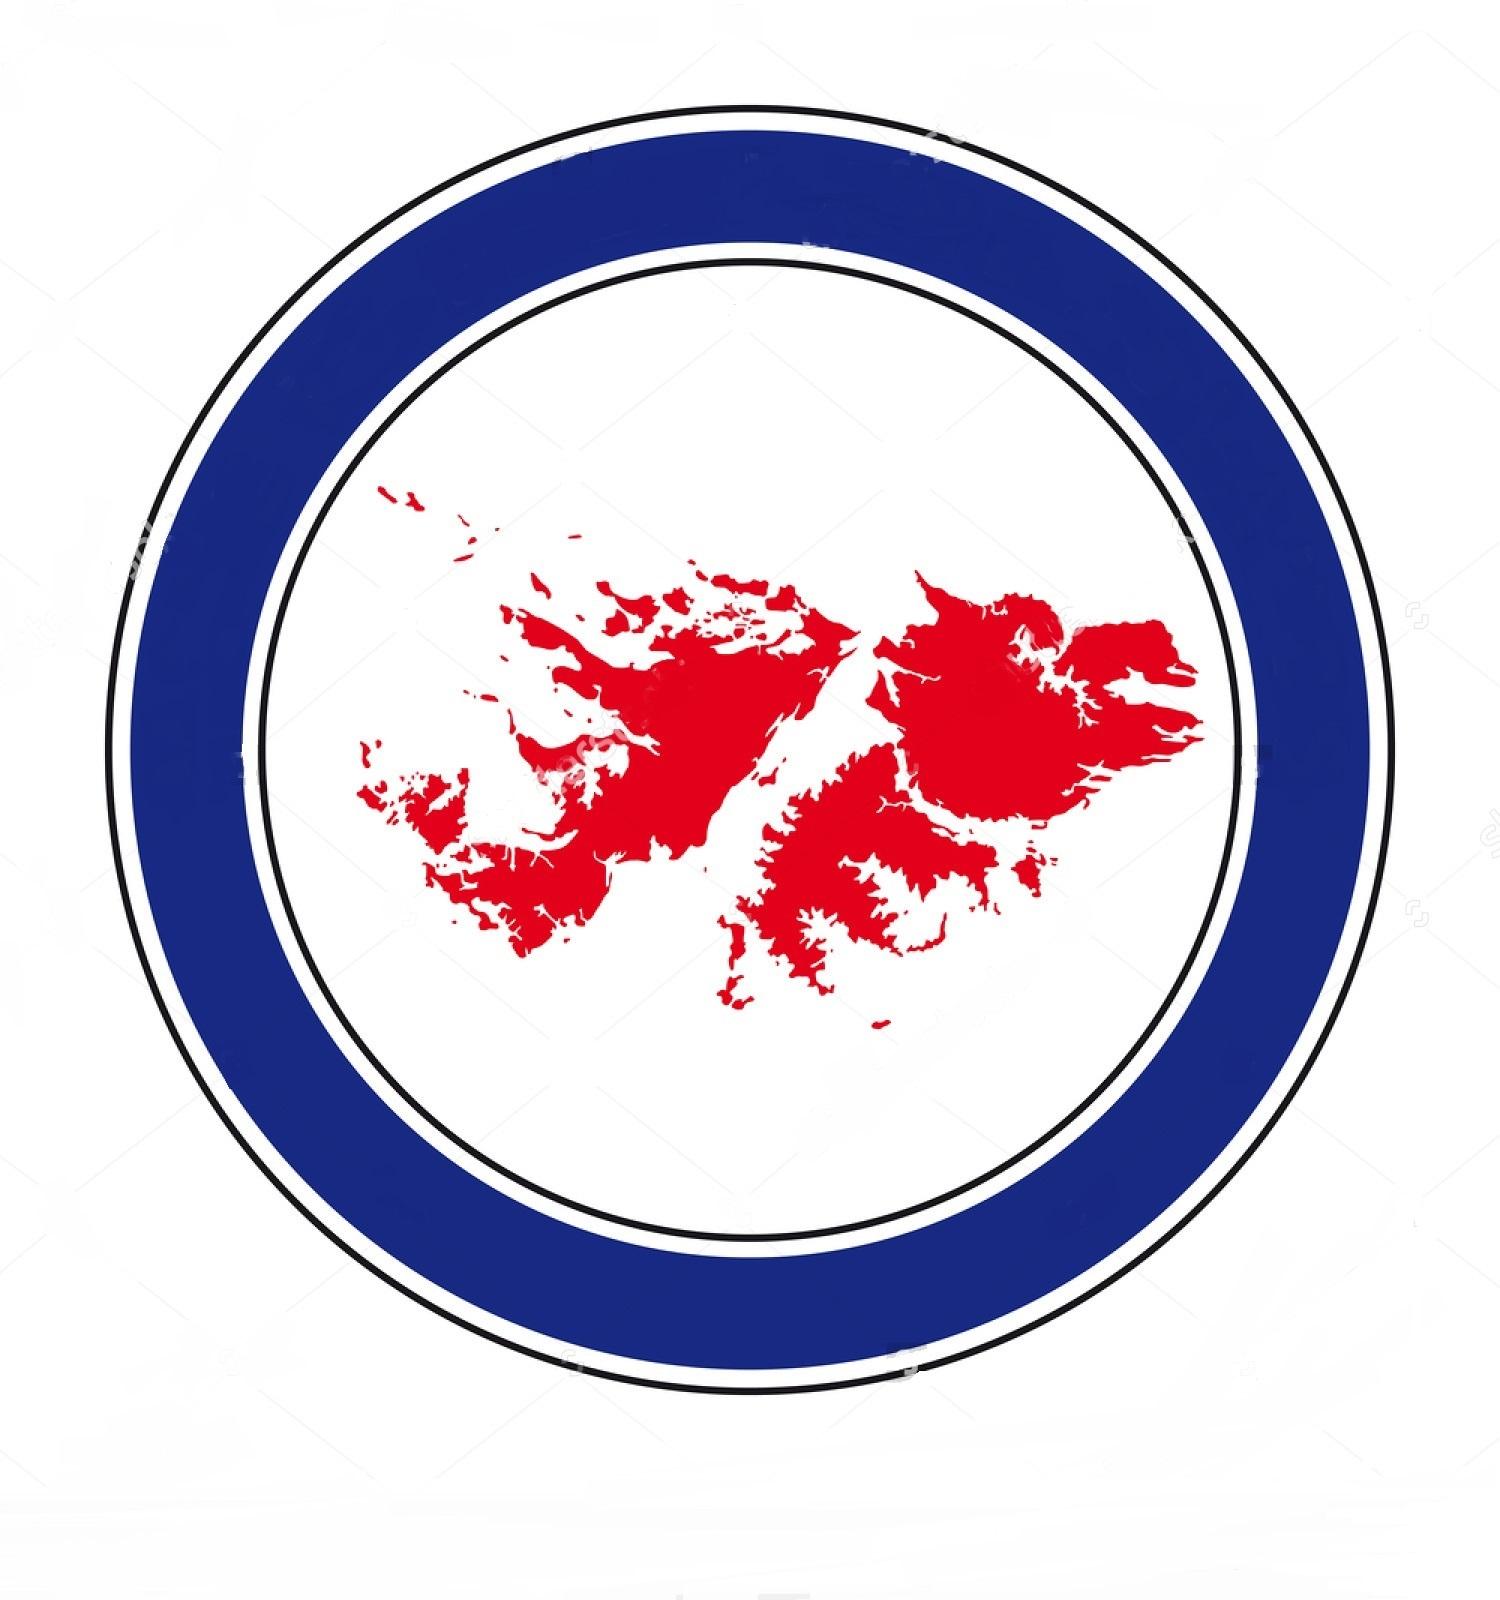 Islas_Brasileras_Company_Logo.jpg